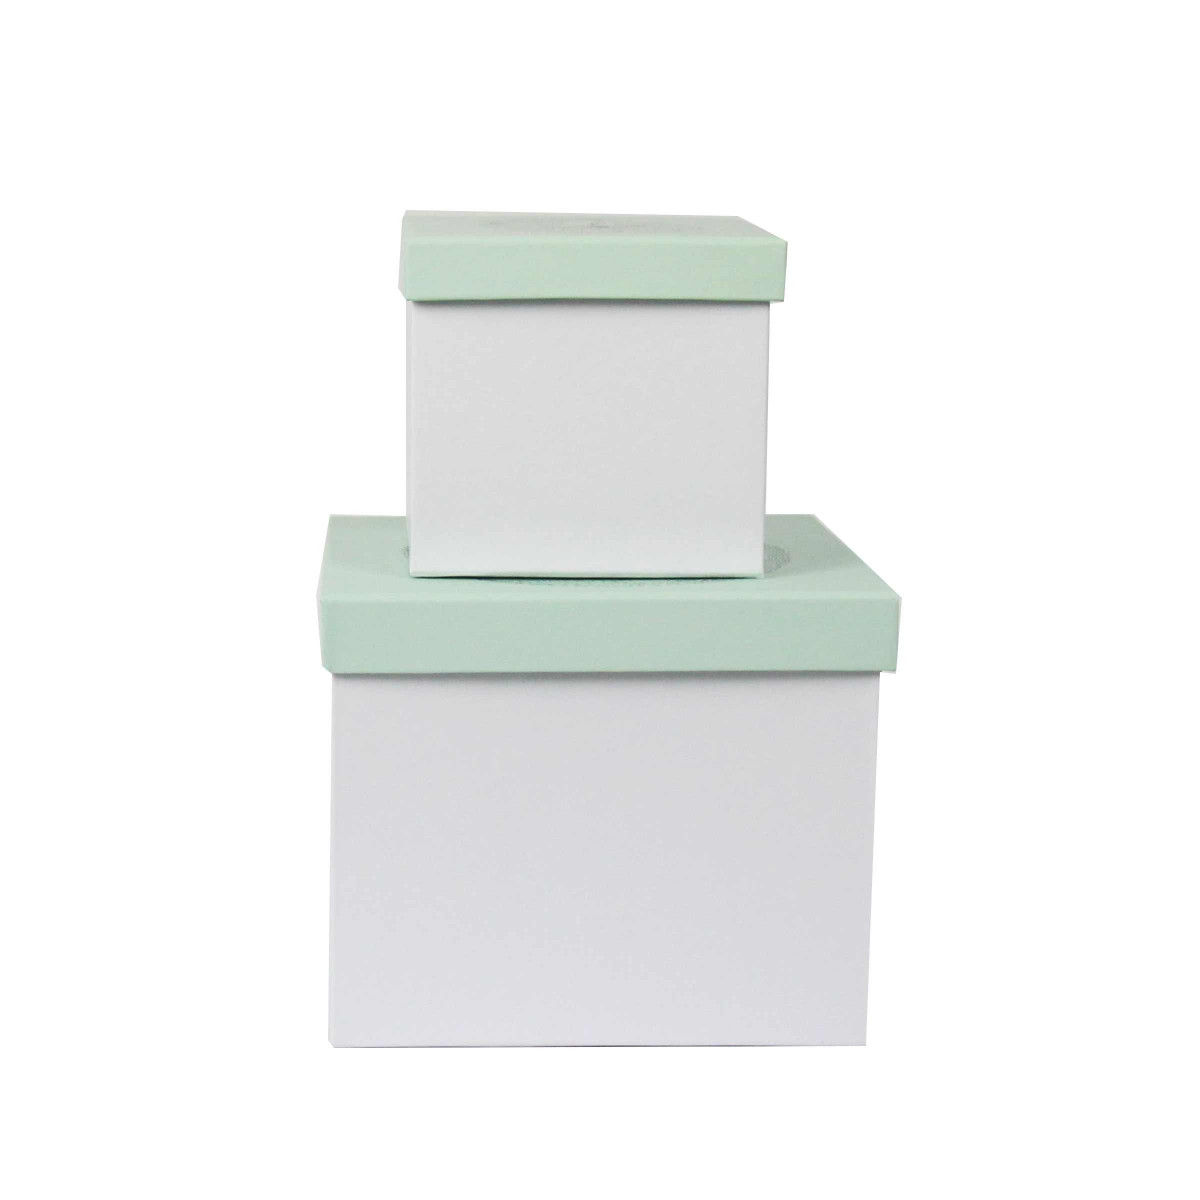 bo tes en carton vert d 39 eau rangement chambre d 39 enfant. Black Bedroom Furniture Sets. Home Design Ideas